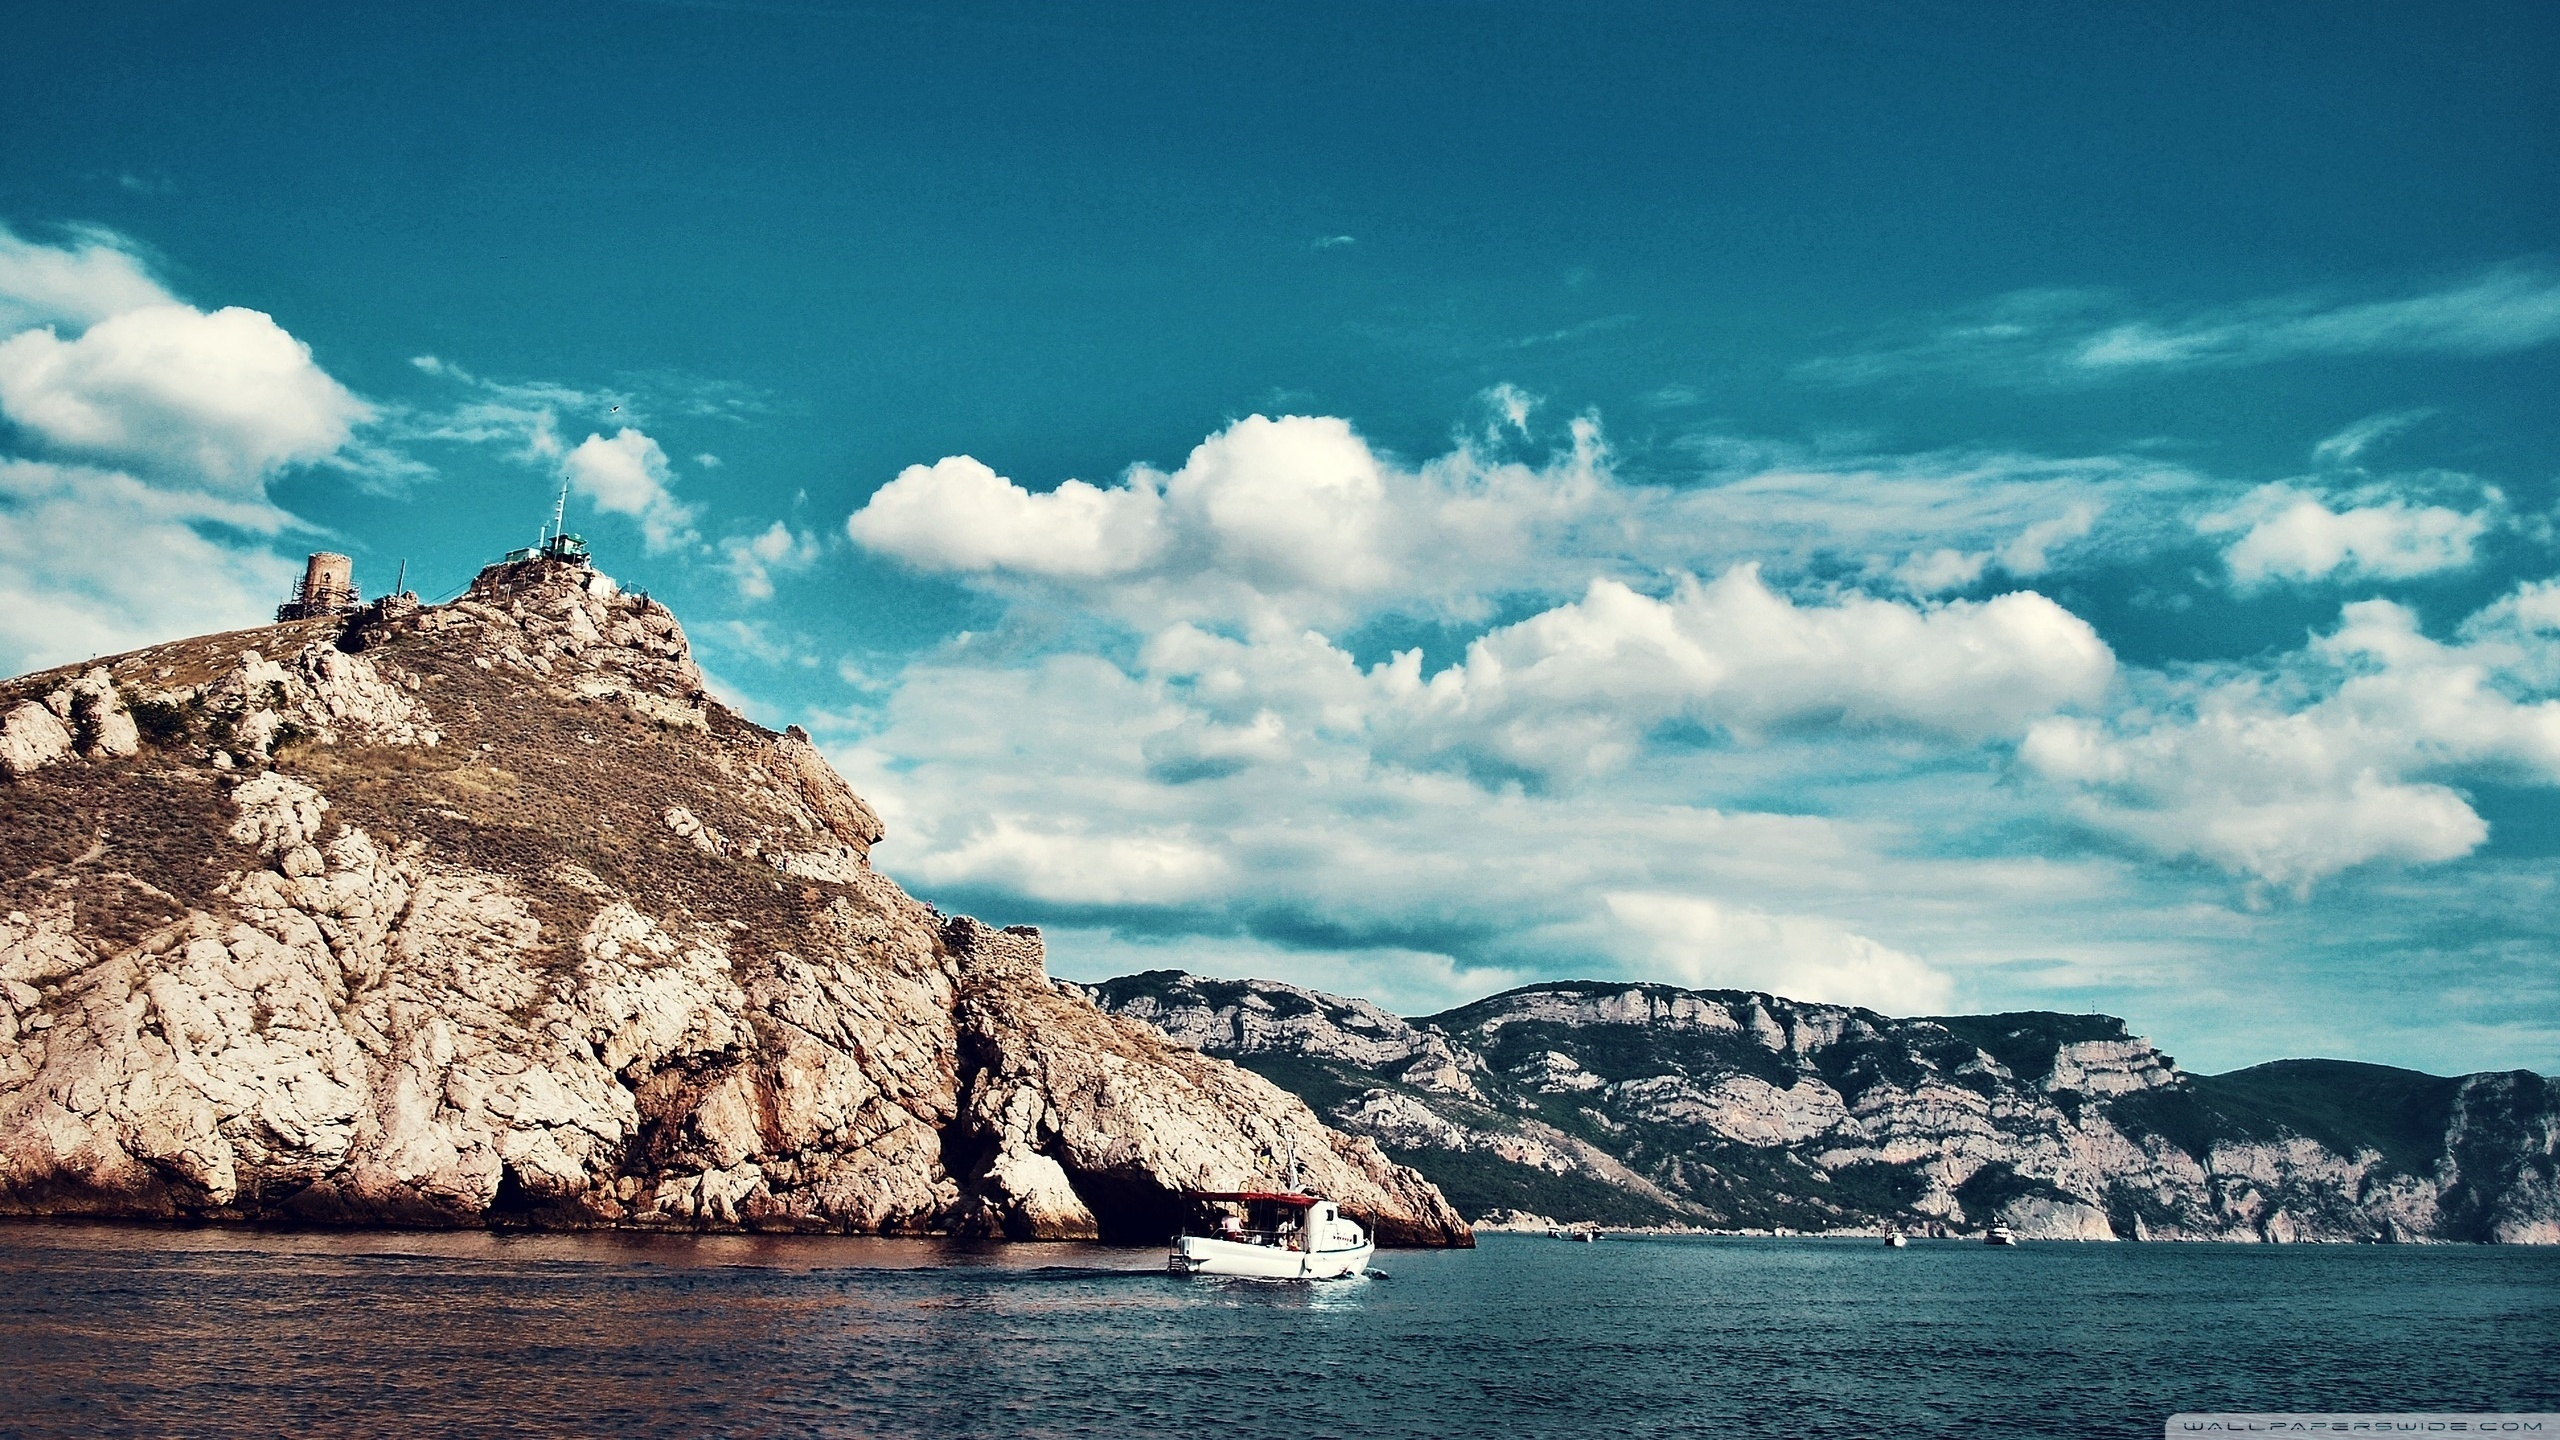 45 greece desktop wallpaper on wallpapersafari - Ancient greece wallpaper hd ...